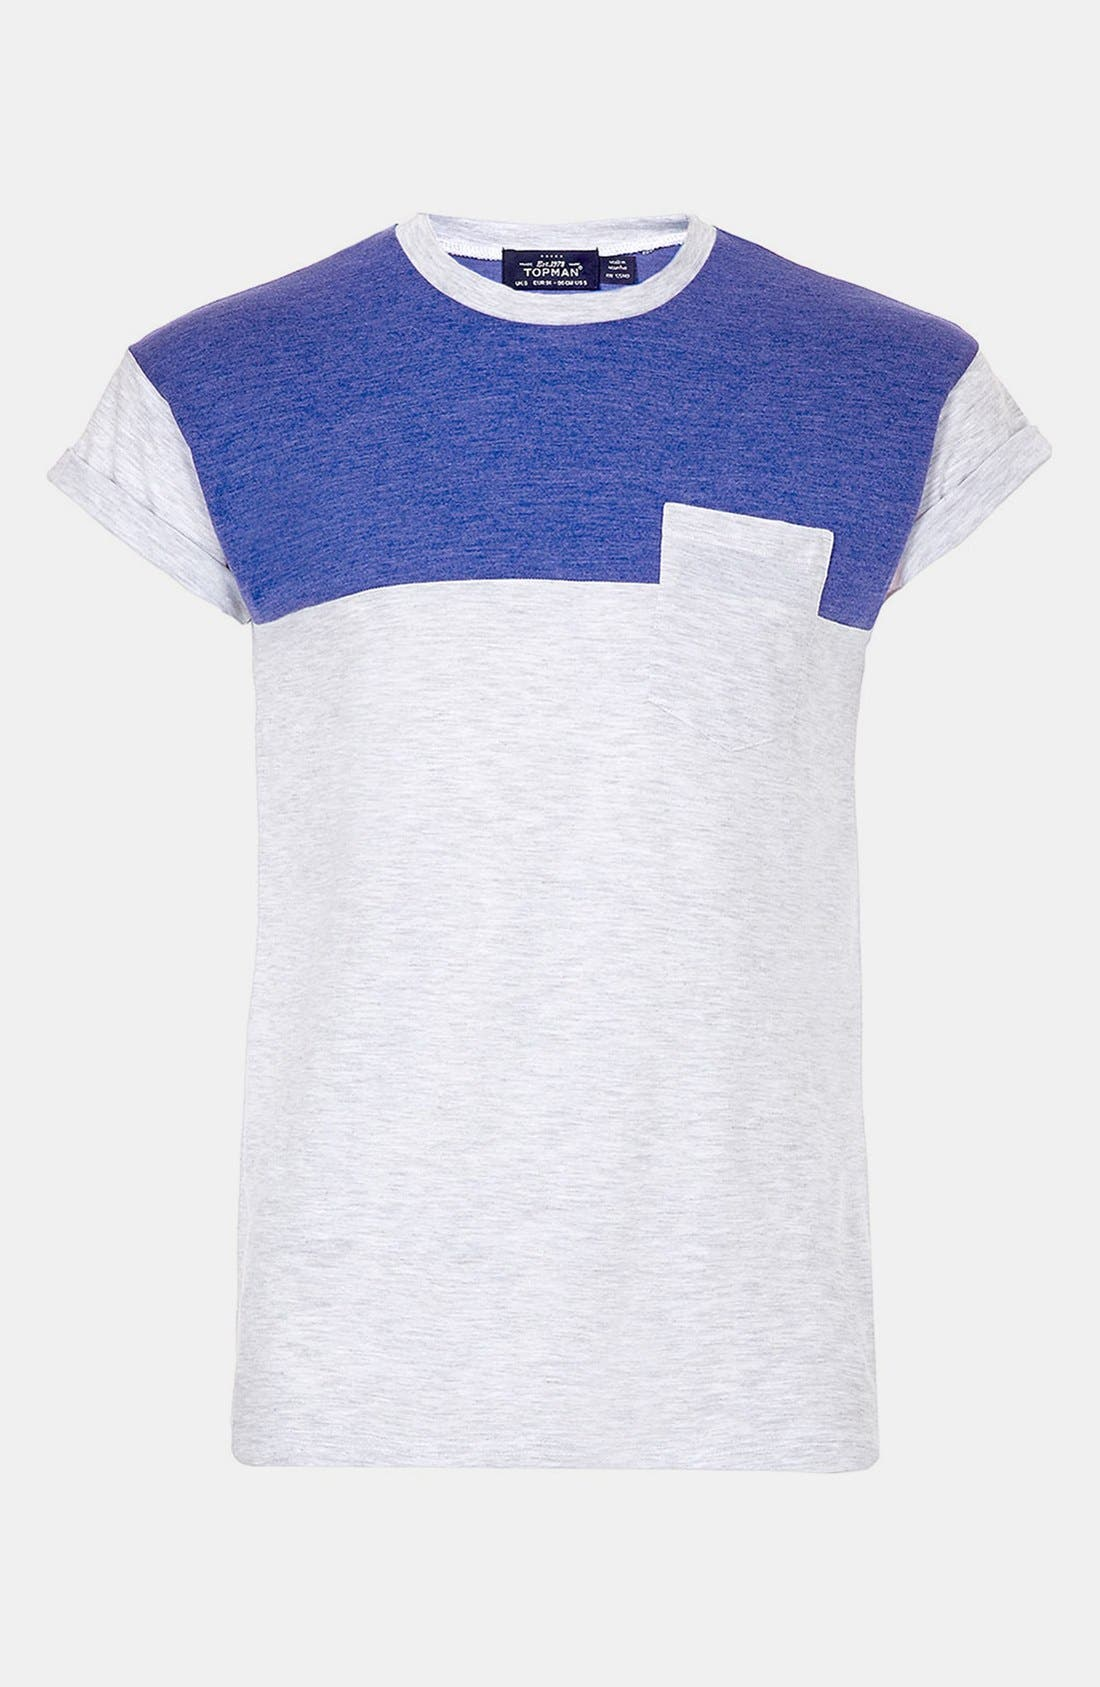 Main Image - Topman 'Cut & Sew' T-Shirt